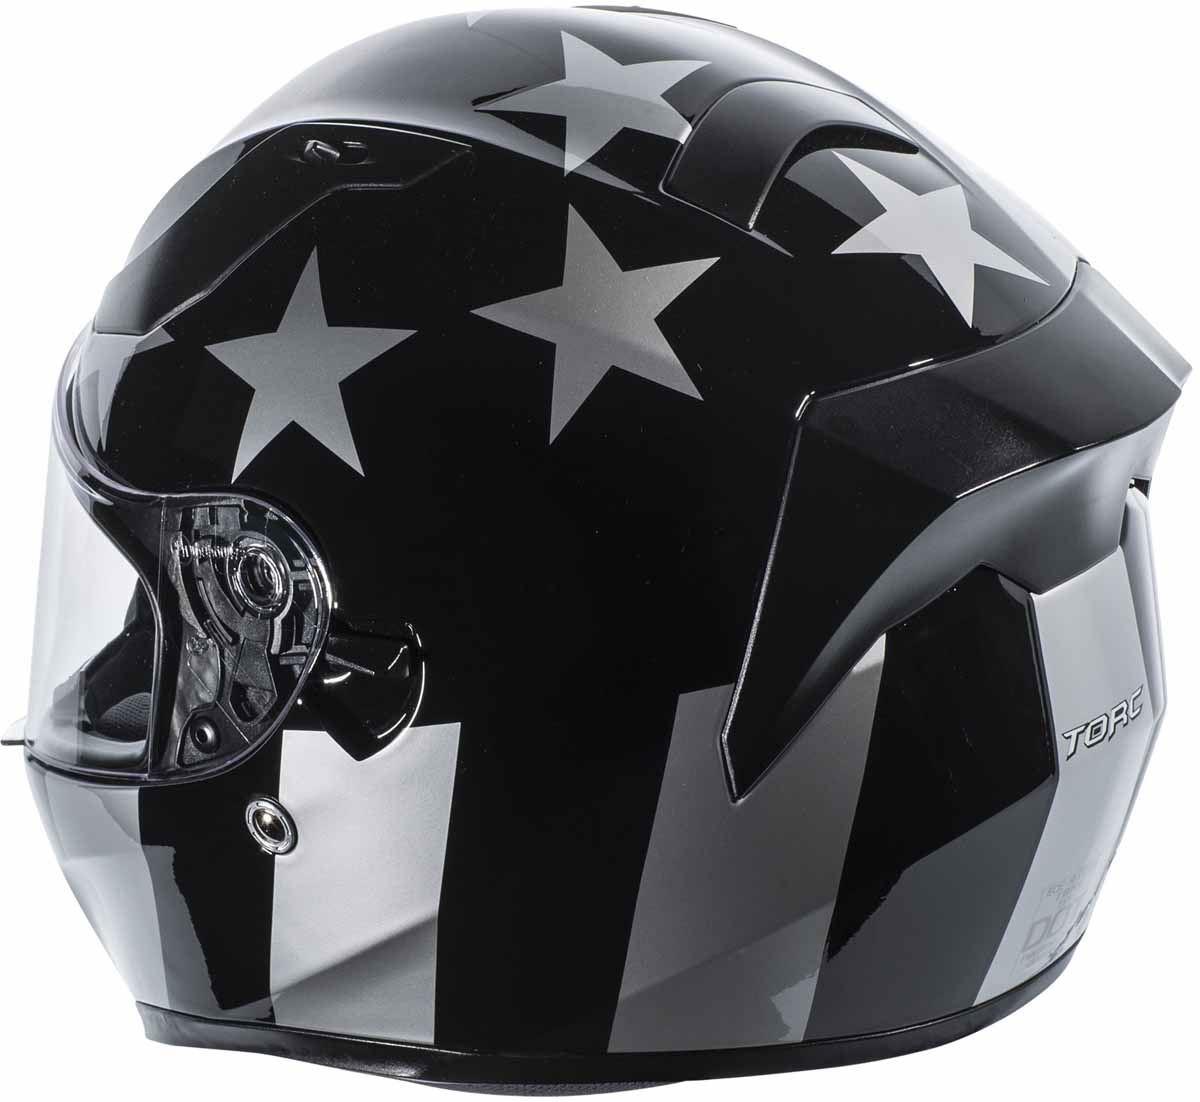 miniature 11 - Torc T15 T15B Helmet Bluetooth Blinc or without - Inner Sun Shield DOT XS-2XL